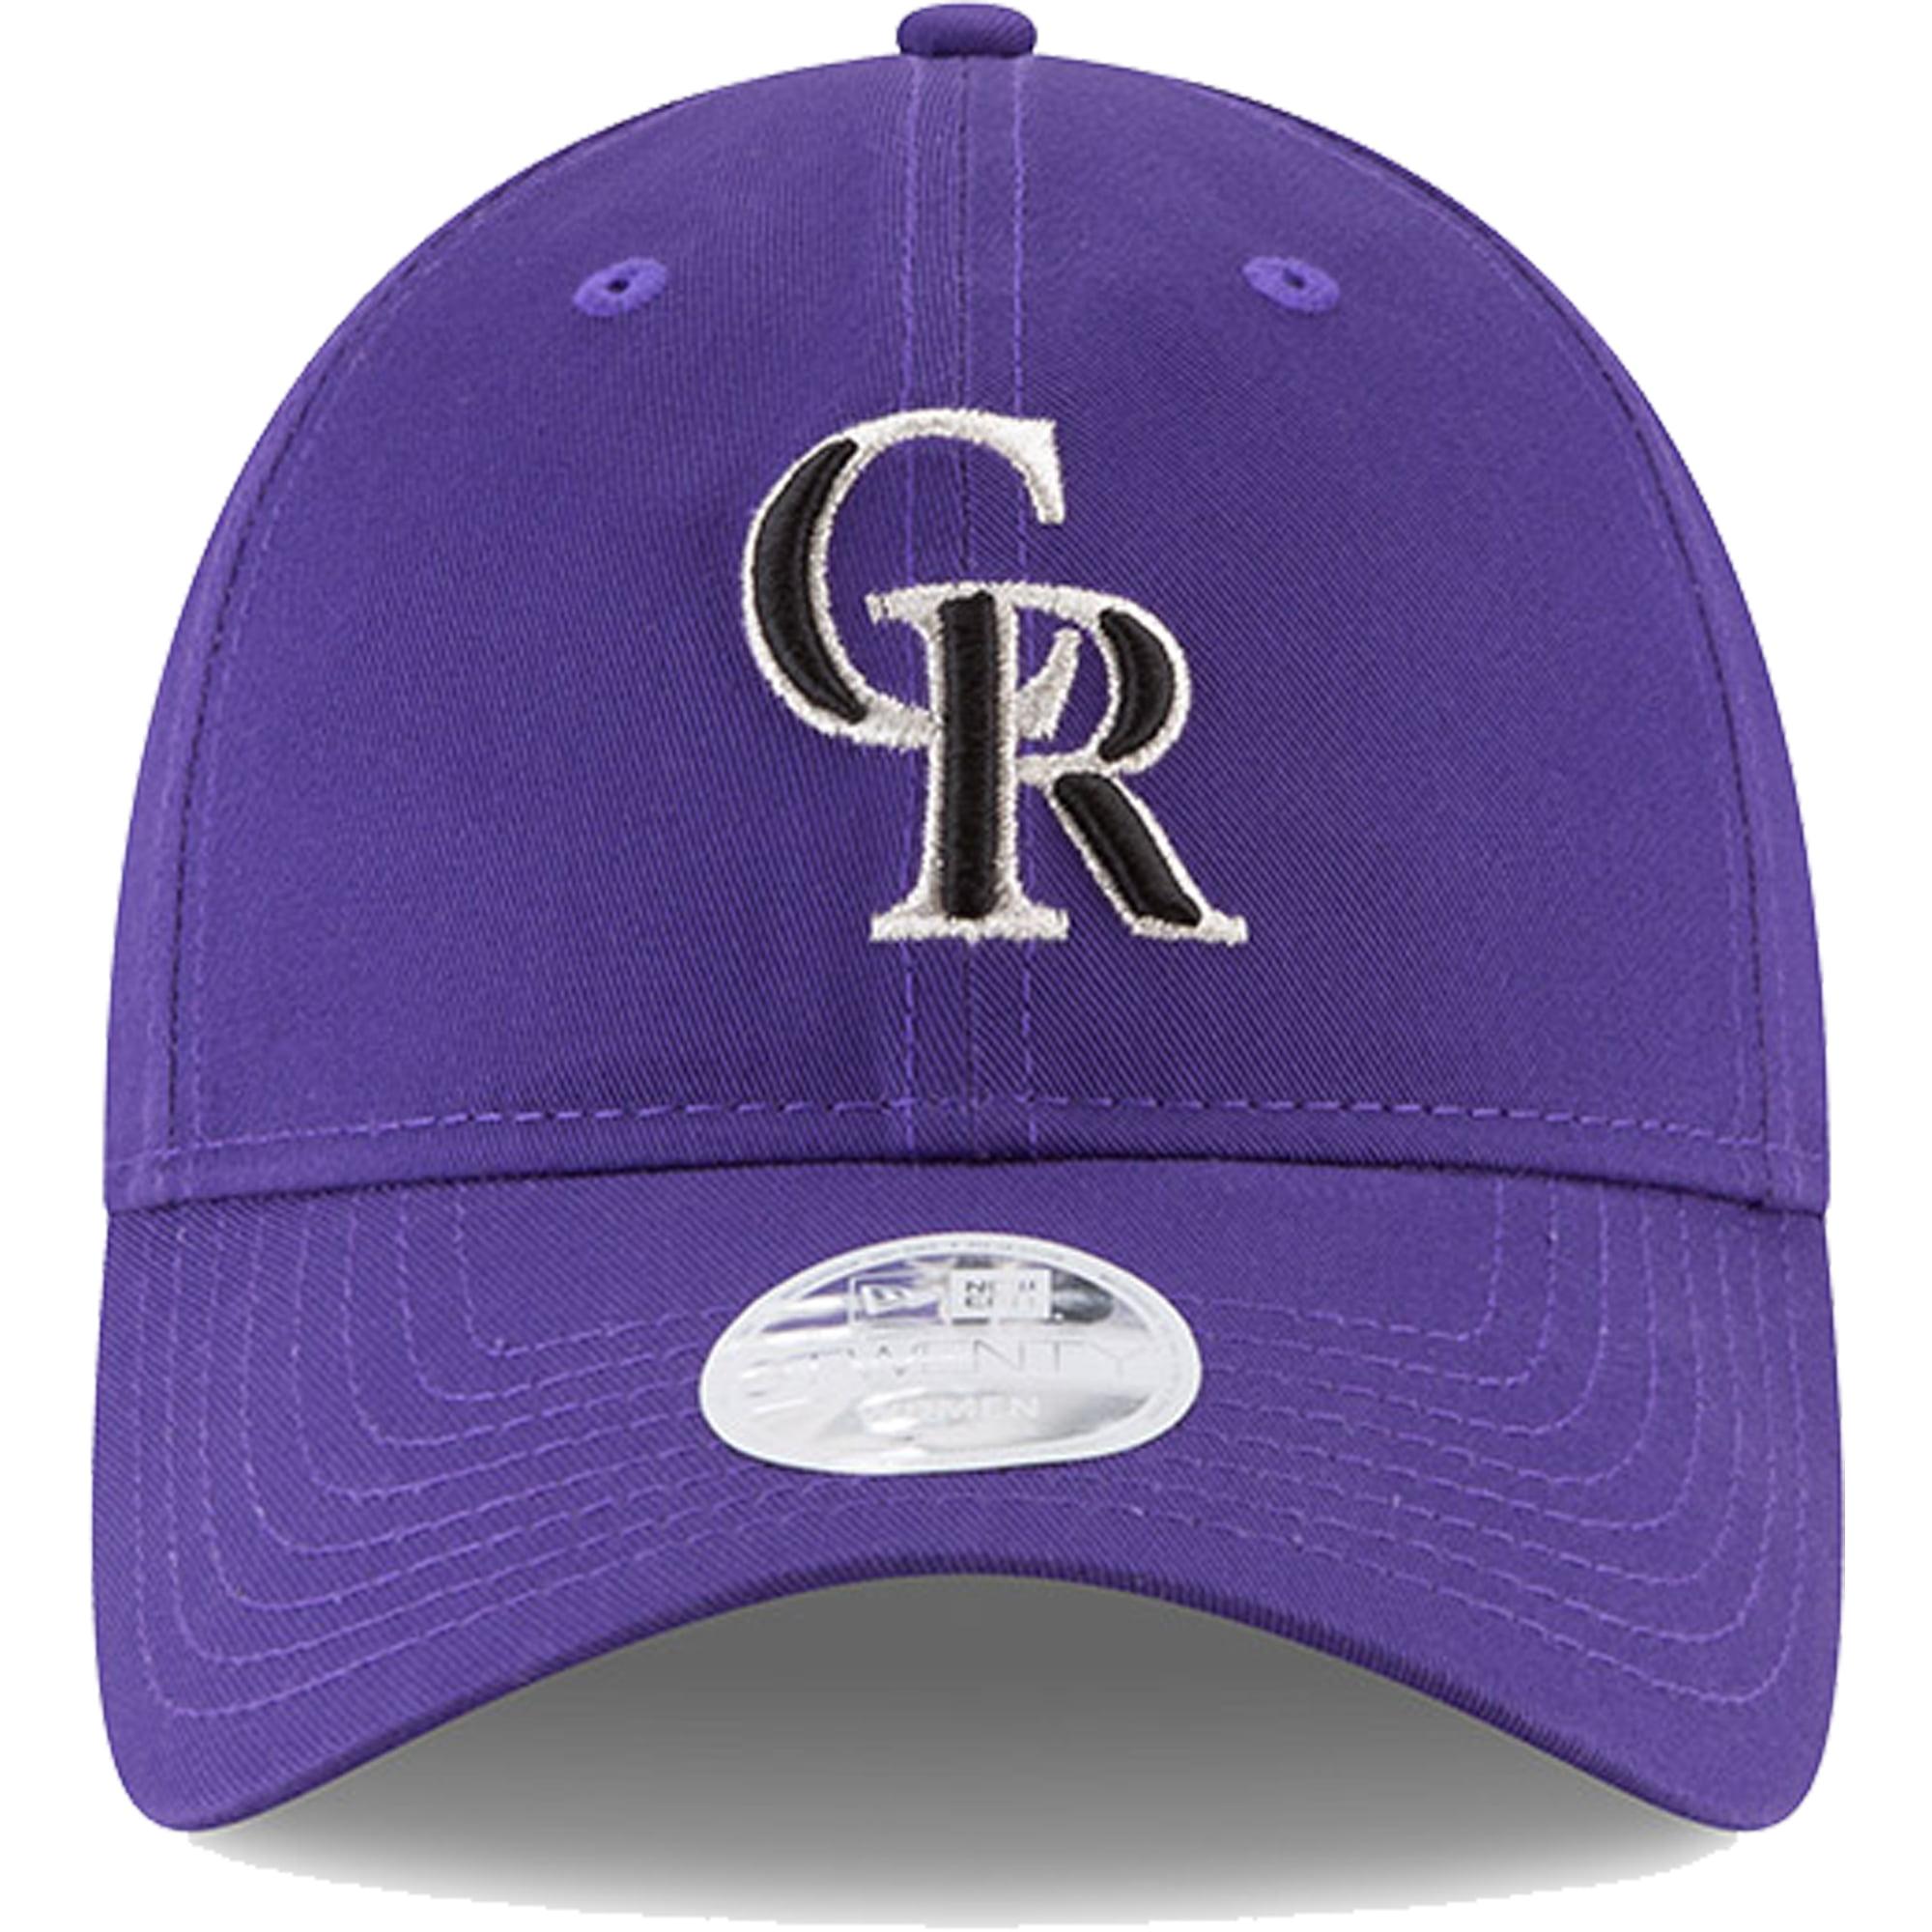 Colorado Rockies New Era Women s 2018 Postseason Side Patch 9TWENTY  Adjustable Hat - Purple - OSFA - Walmart.com 026ce369cc46